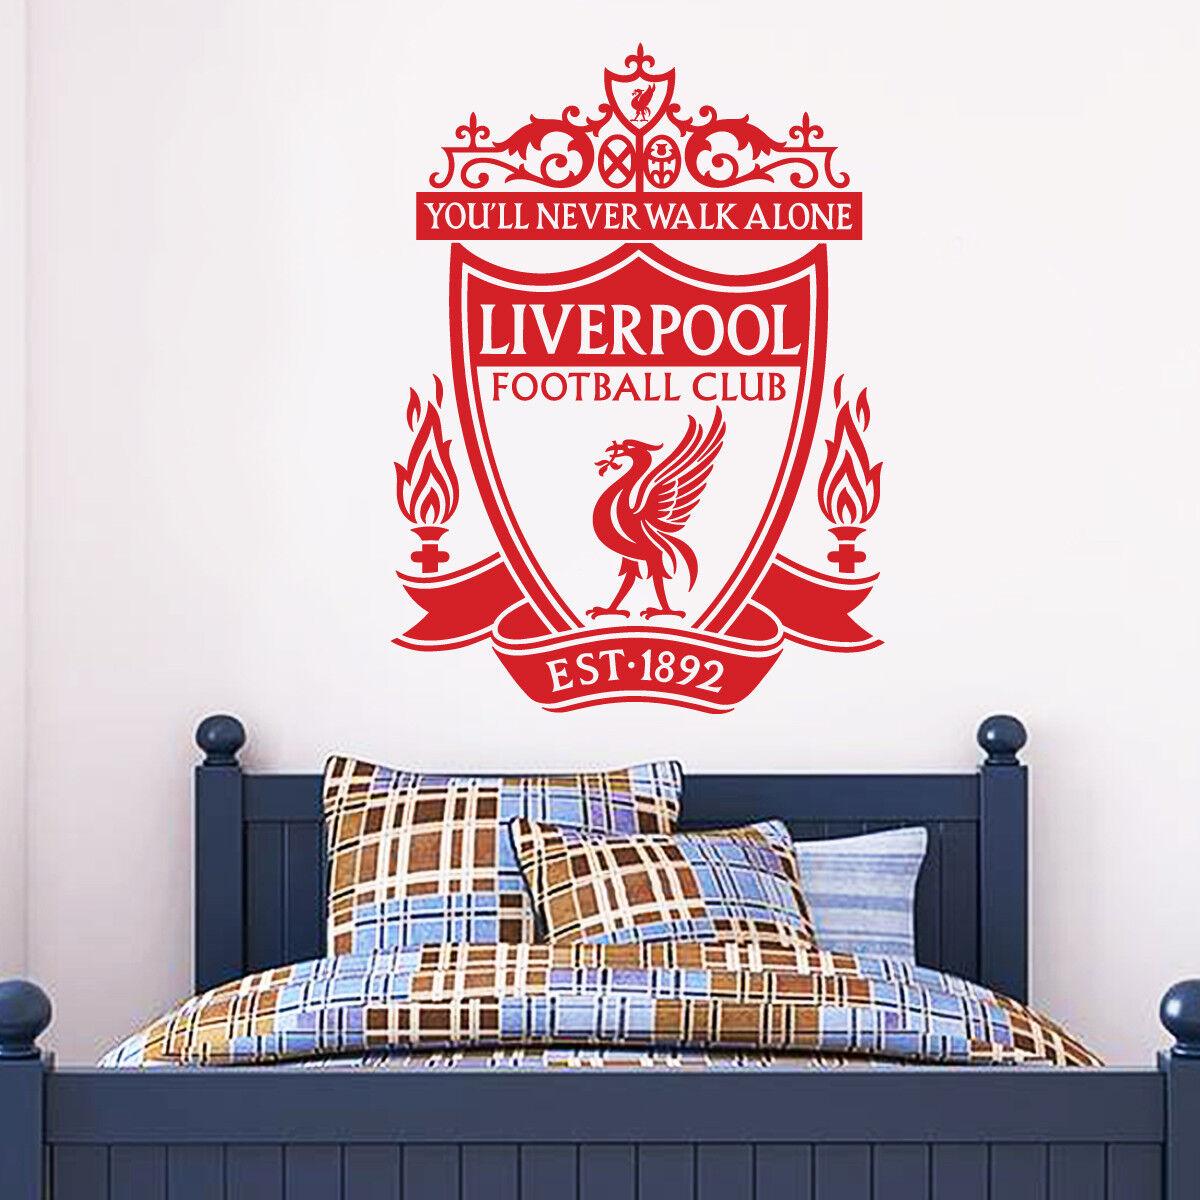 Liverpool Football Club eine Farbe Wappen Wandaufkleber + Lfc Aufkleber Set